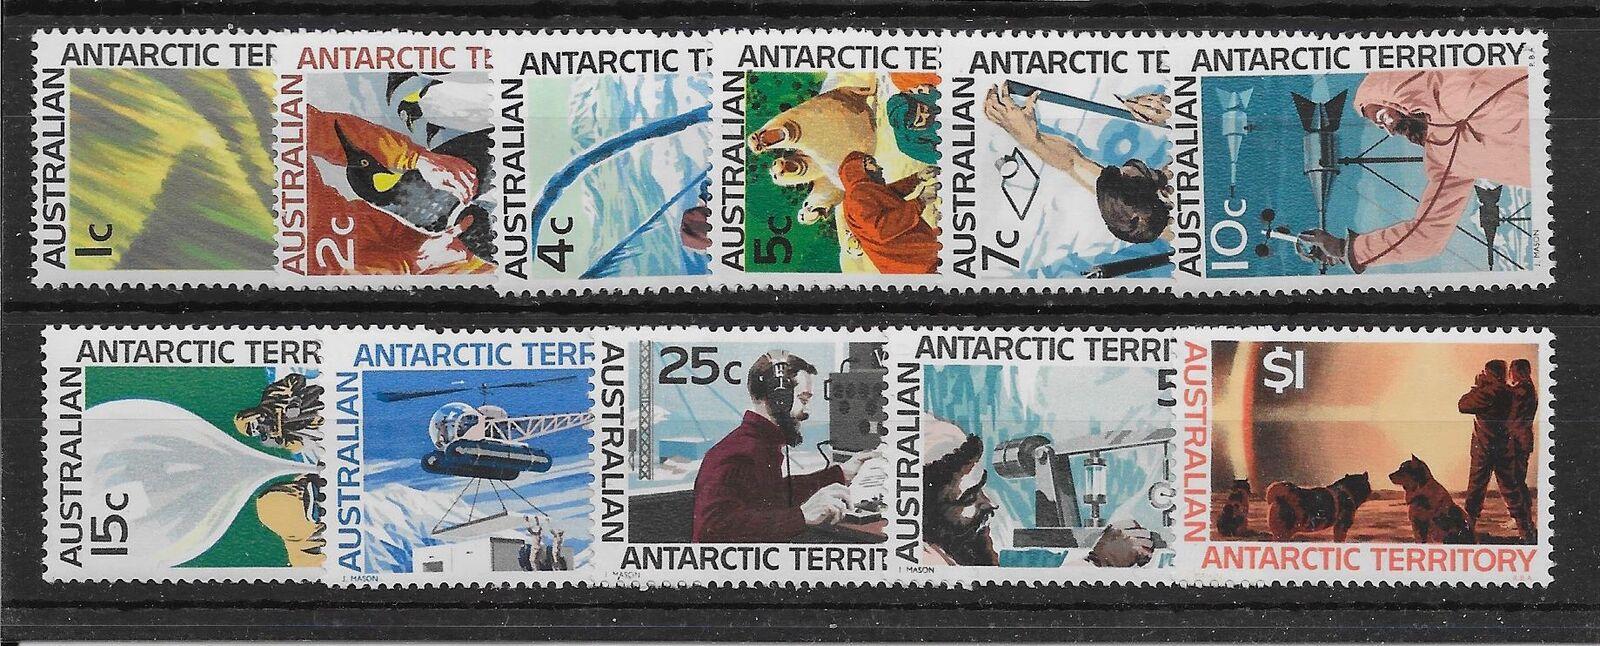 AUSTRALIAN ANTARCTIC TERR SG8/18 1966-8 DEFINITIVE SET MNH